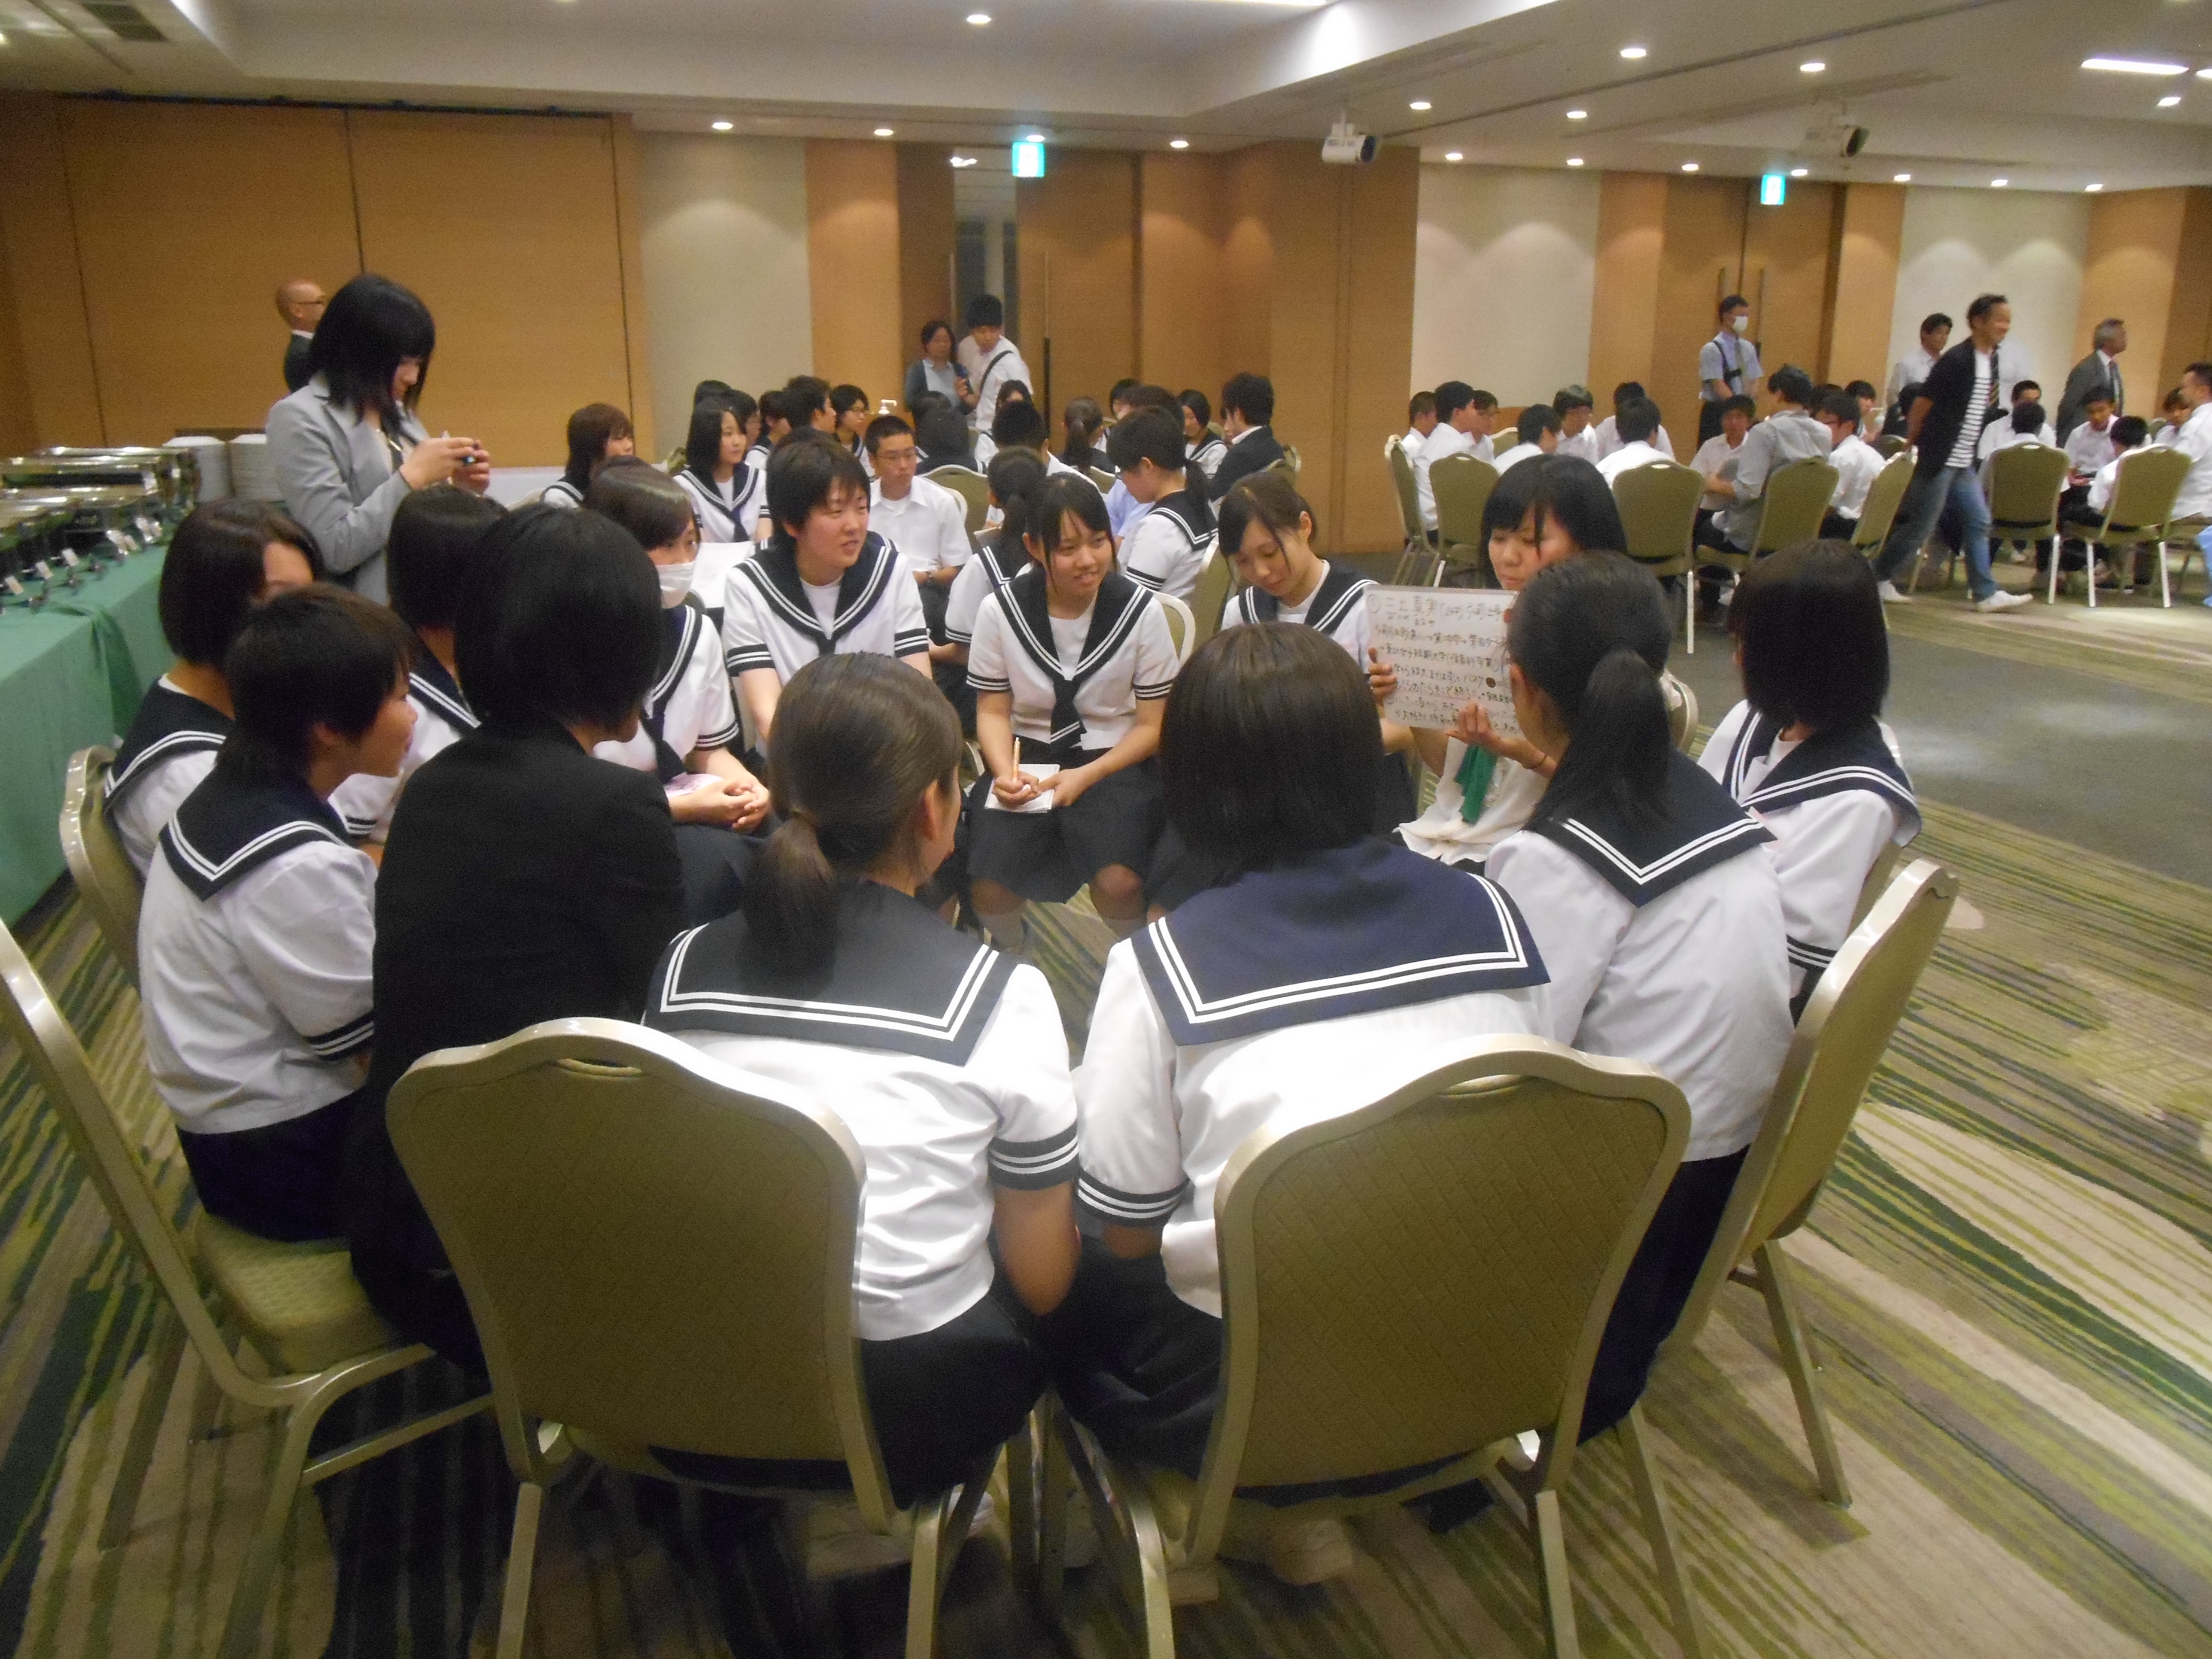 DSCN4408 - AOsuki主催:青森市内の中学校(修学旅行)に夢を与える時間